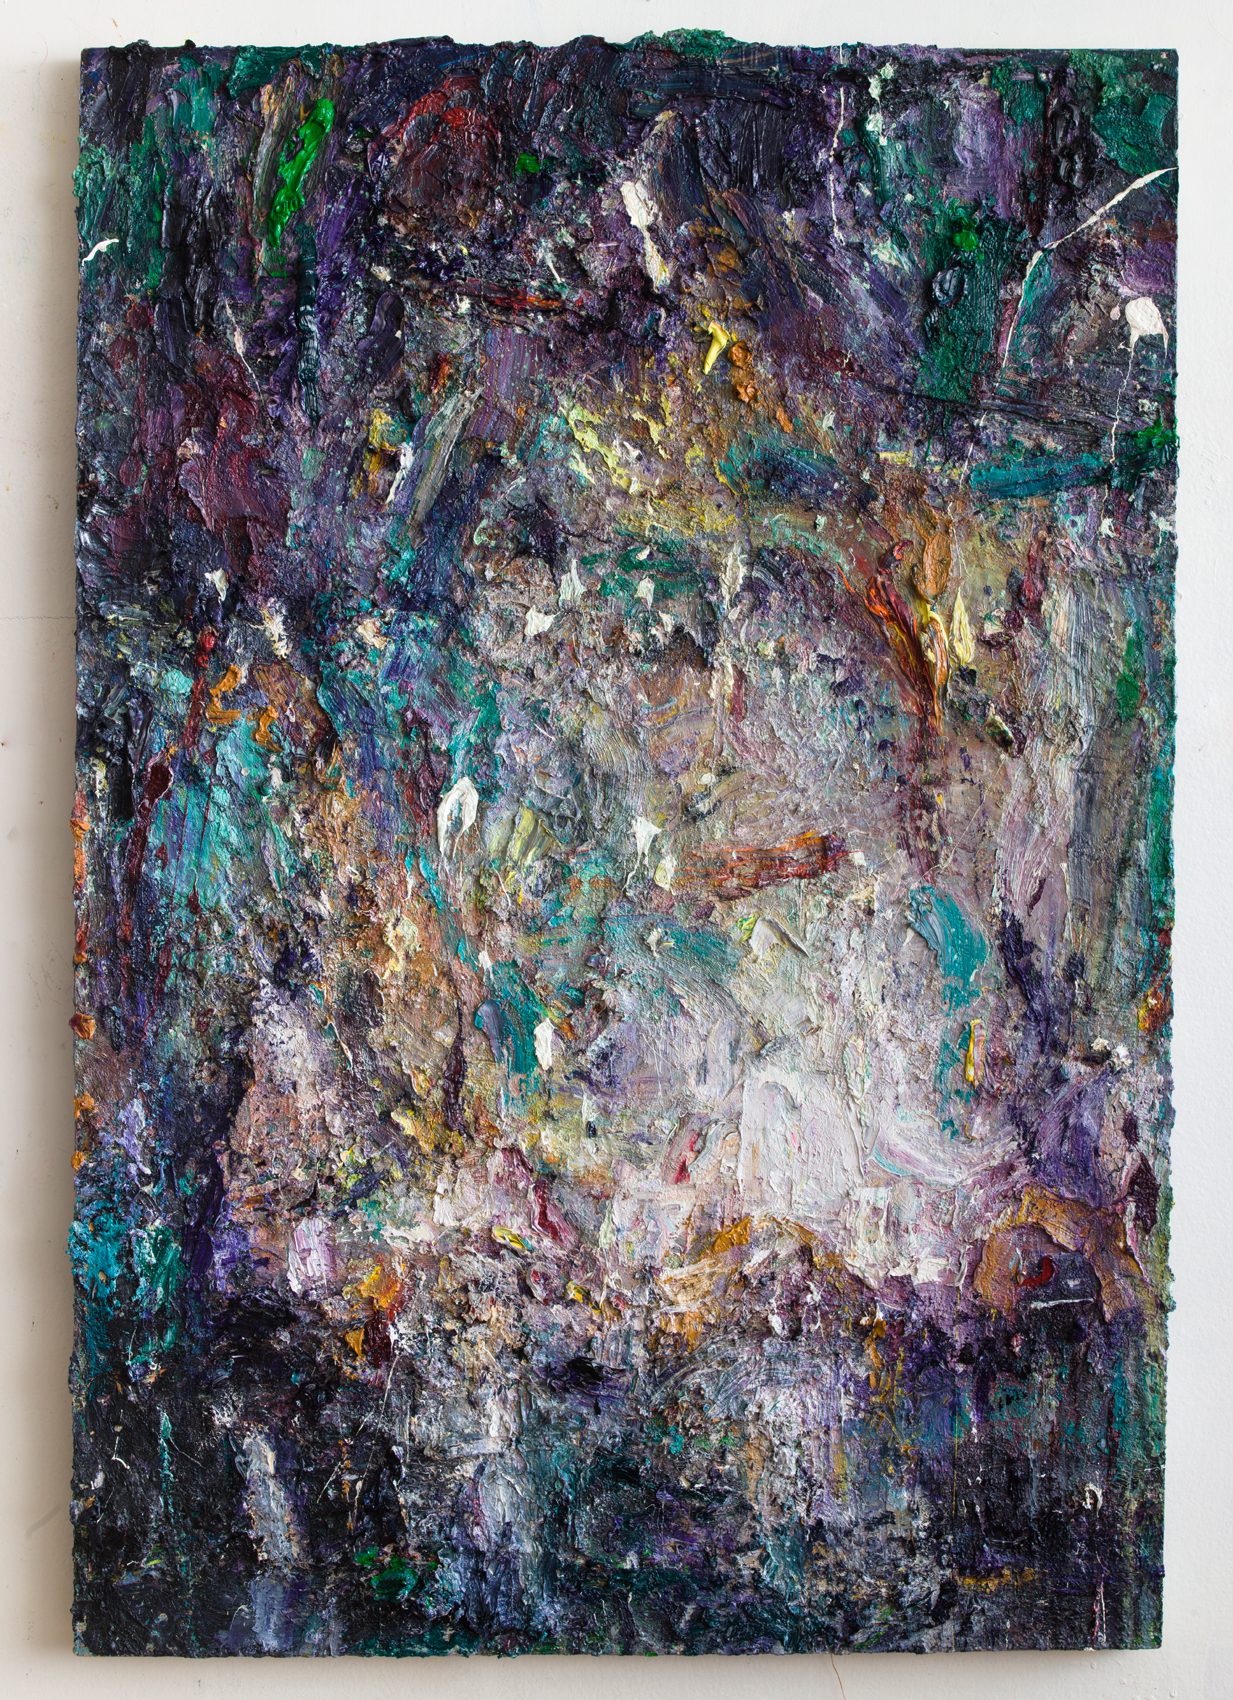 13.Barbara Laube Portal.jpg 44x30%22oil on canvas.jpg